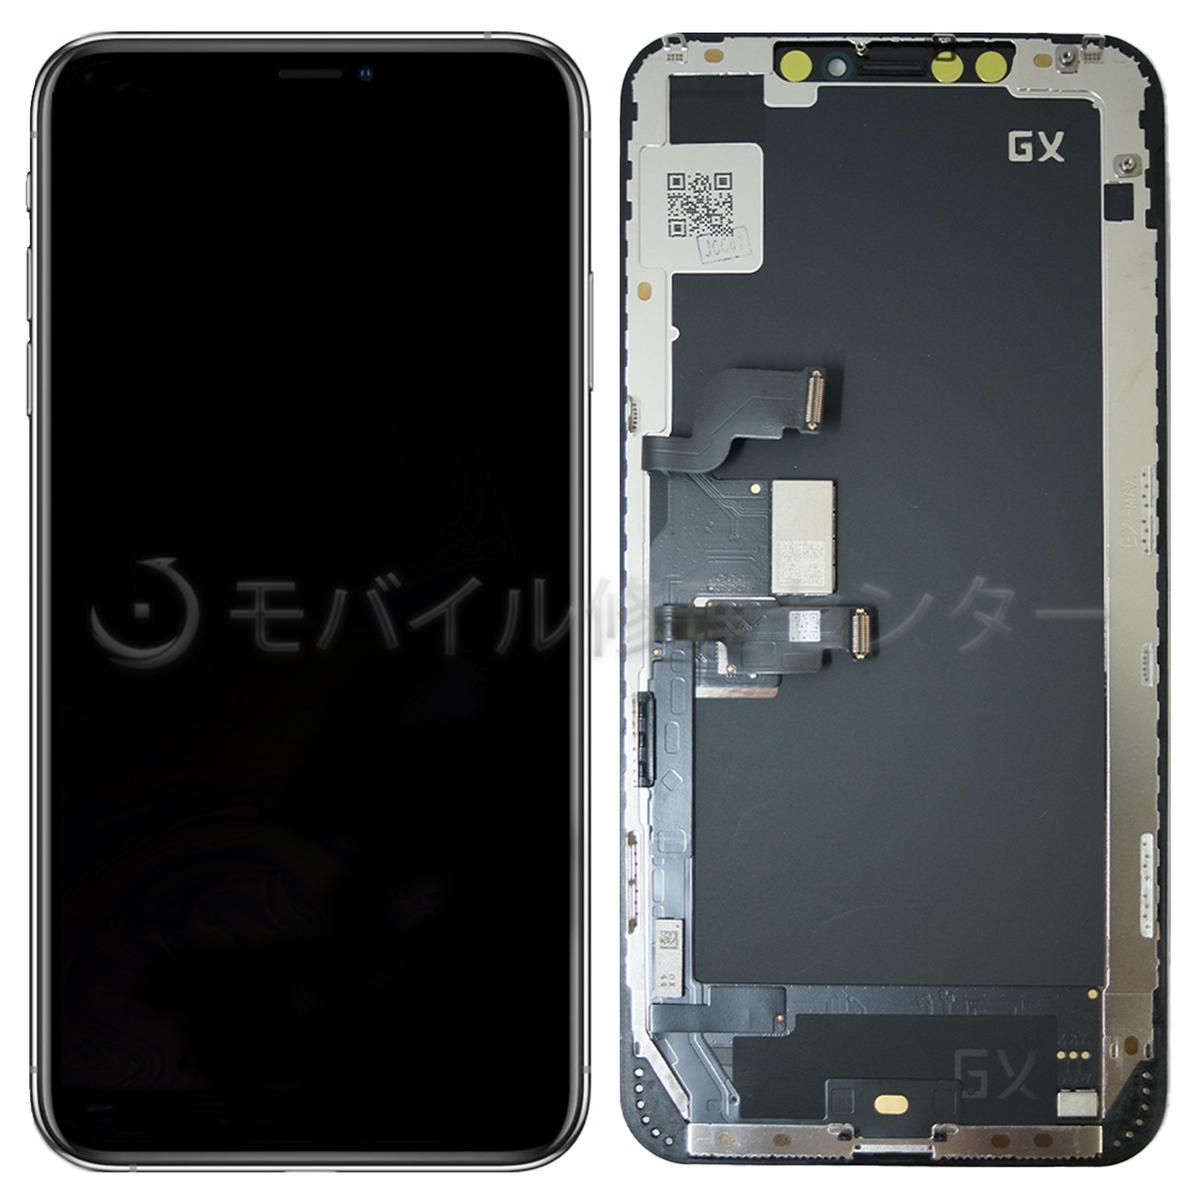 iPhoneXSMAXの液晶交換の際にどうぞ。 iPhoneXSMAX 【OLED硬質素材】 フロントパネル 液晶パネル 画面交換 修理用交換用